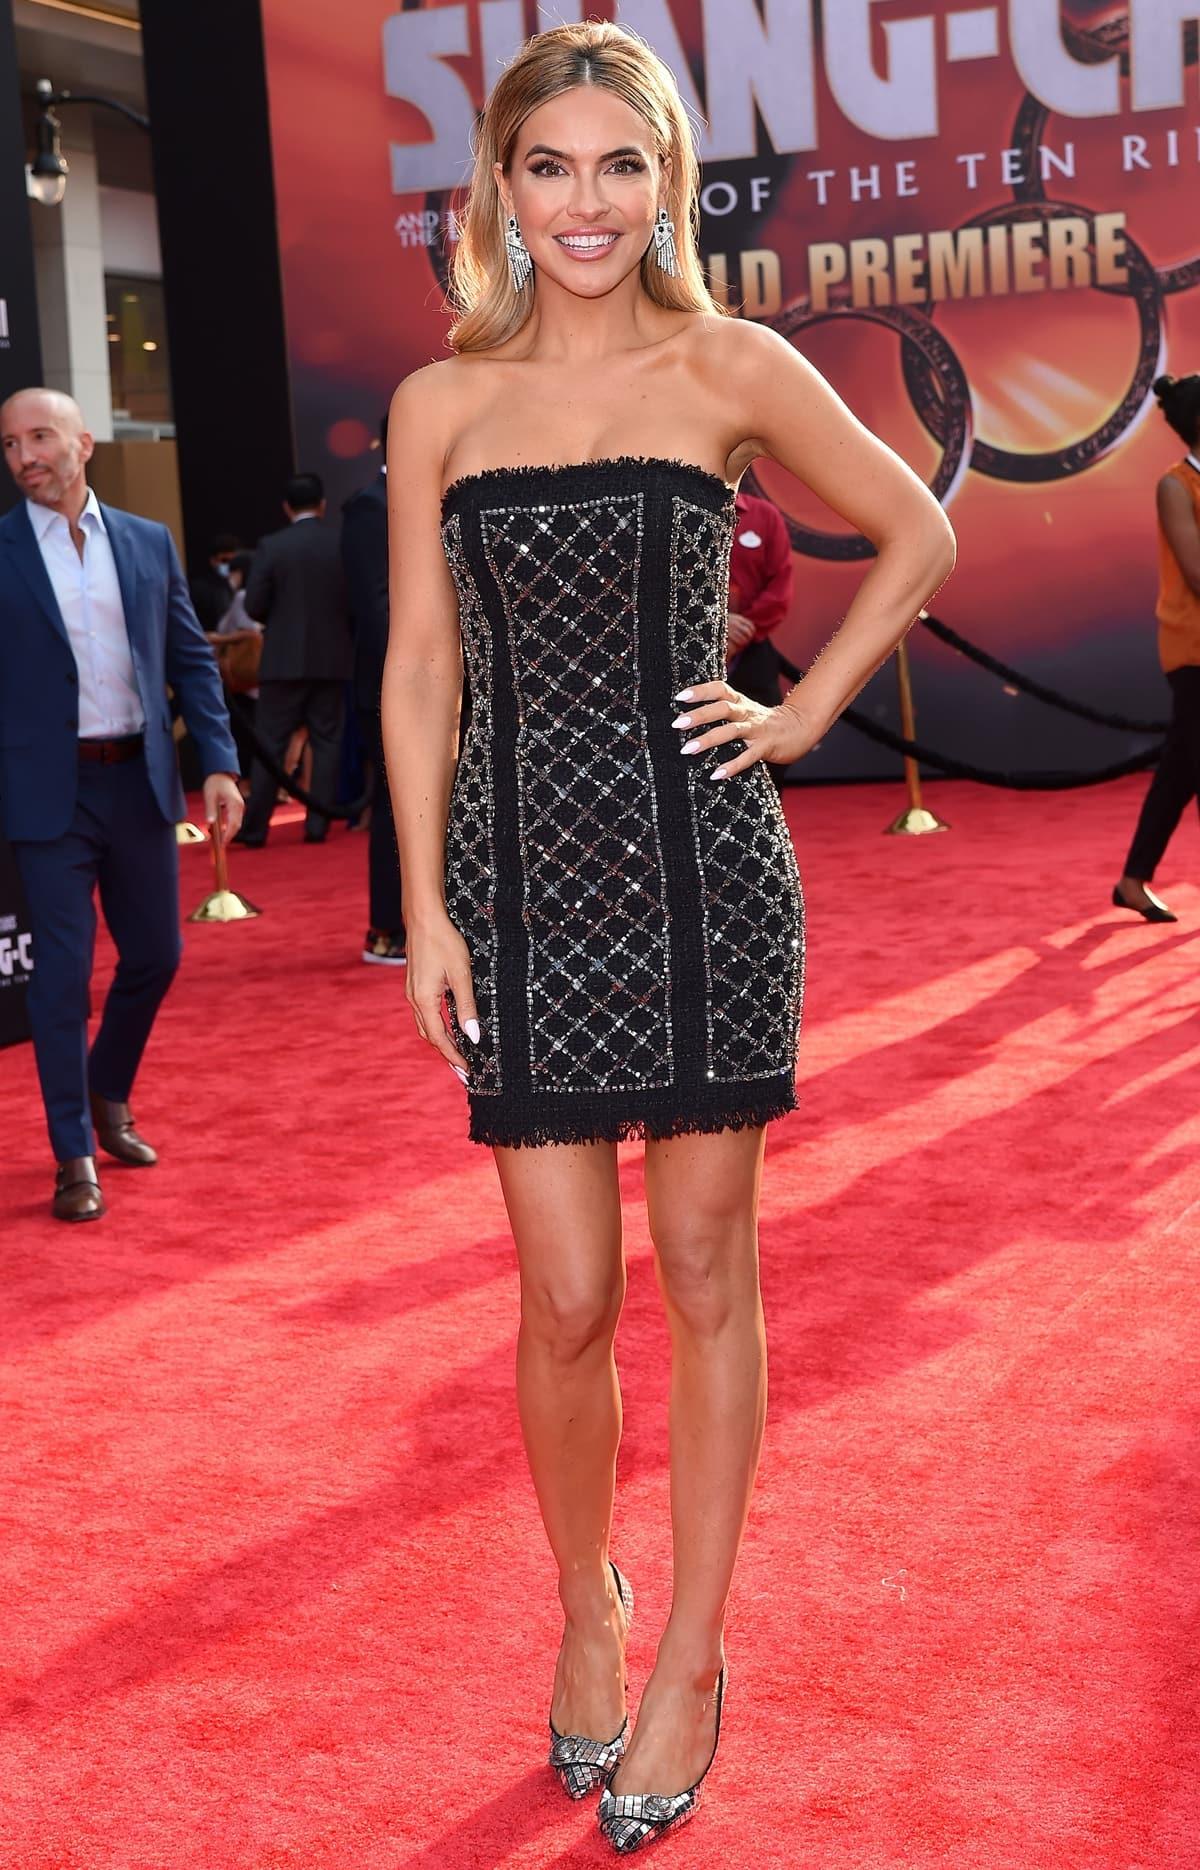 Chrishell Stause flaunts her legs in a black glittering strapless Balmain mini dress